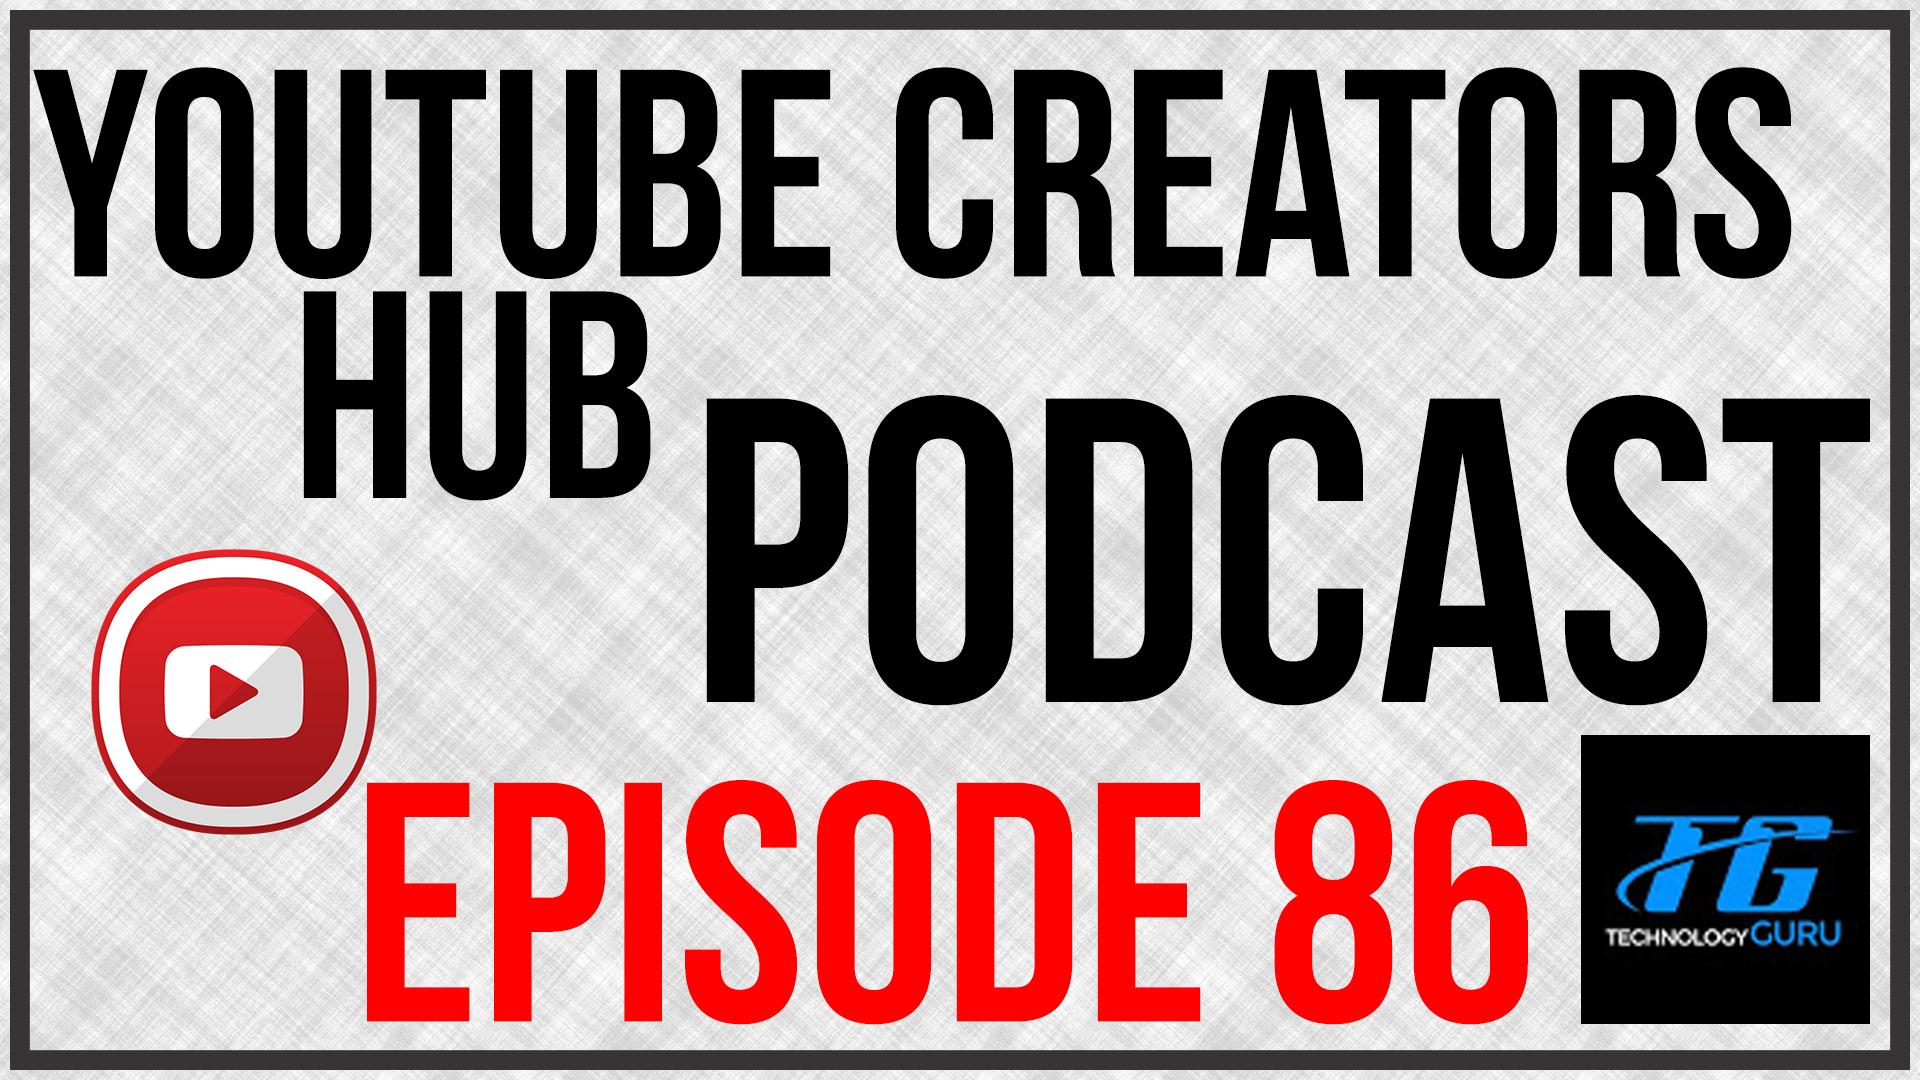 YouTube Creators Hub Podcast Episode 86